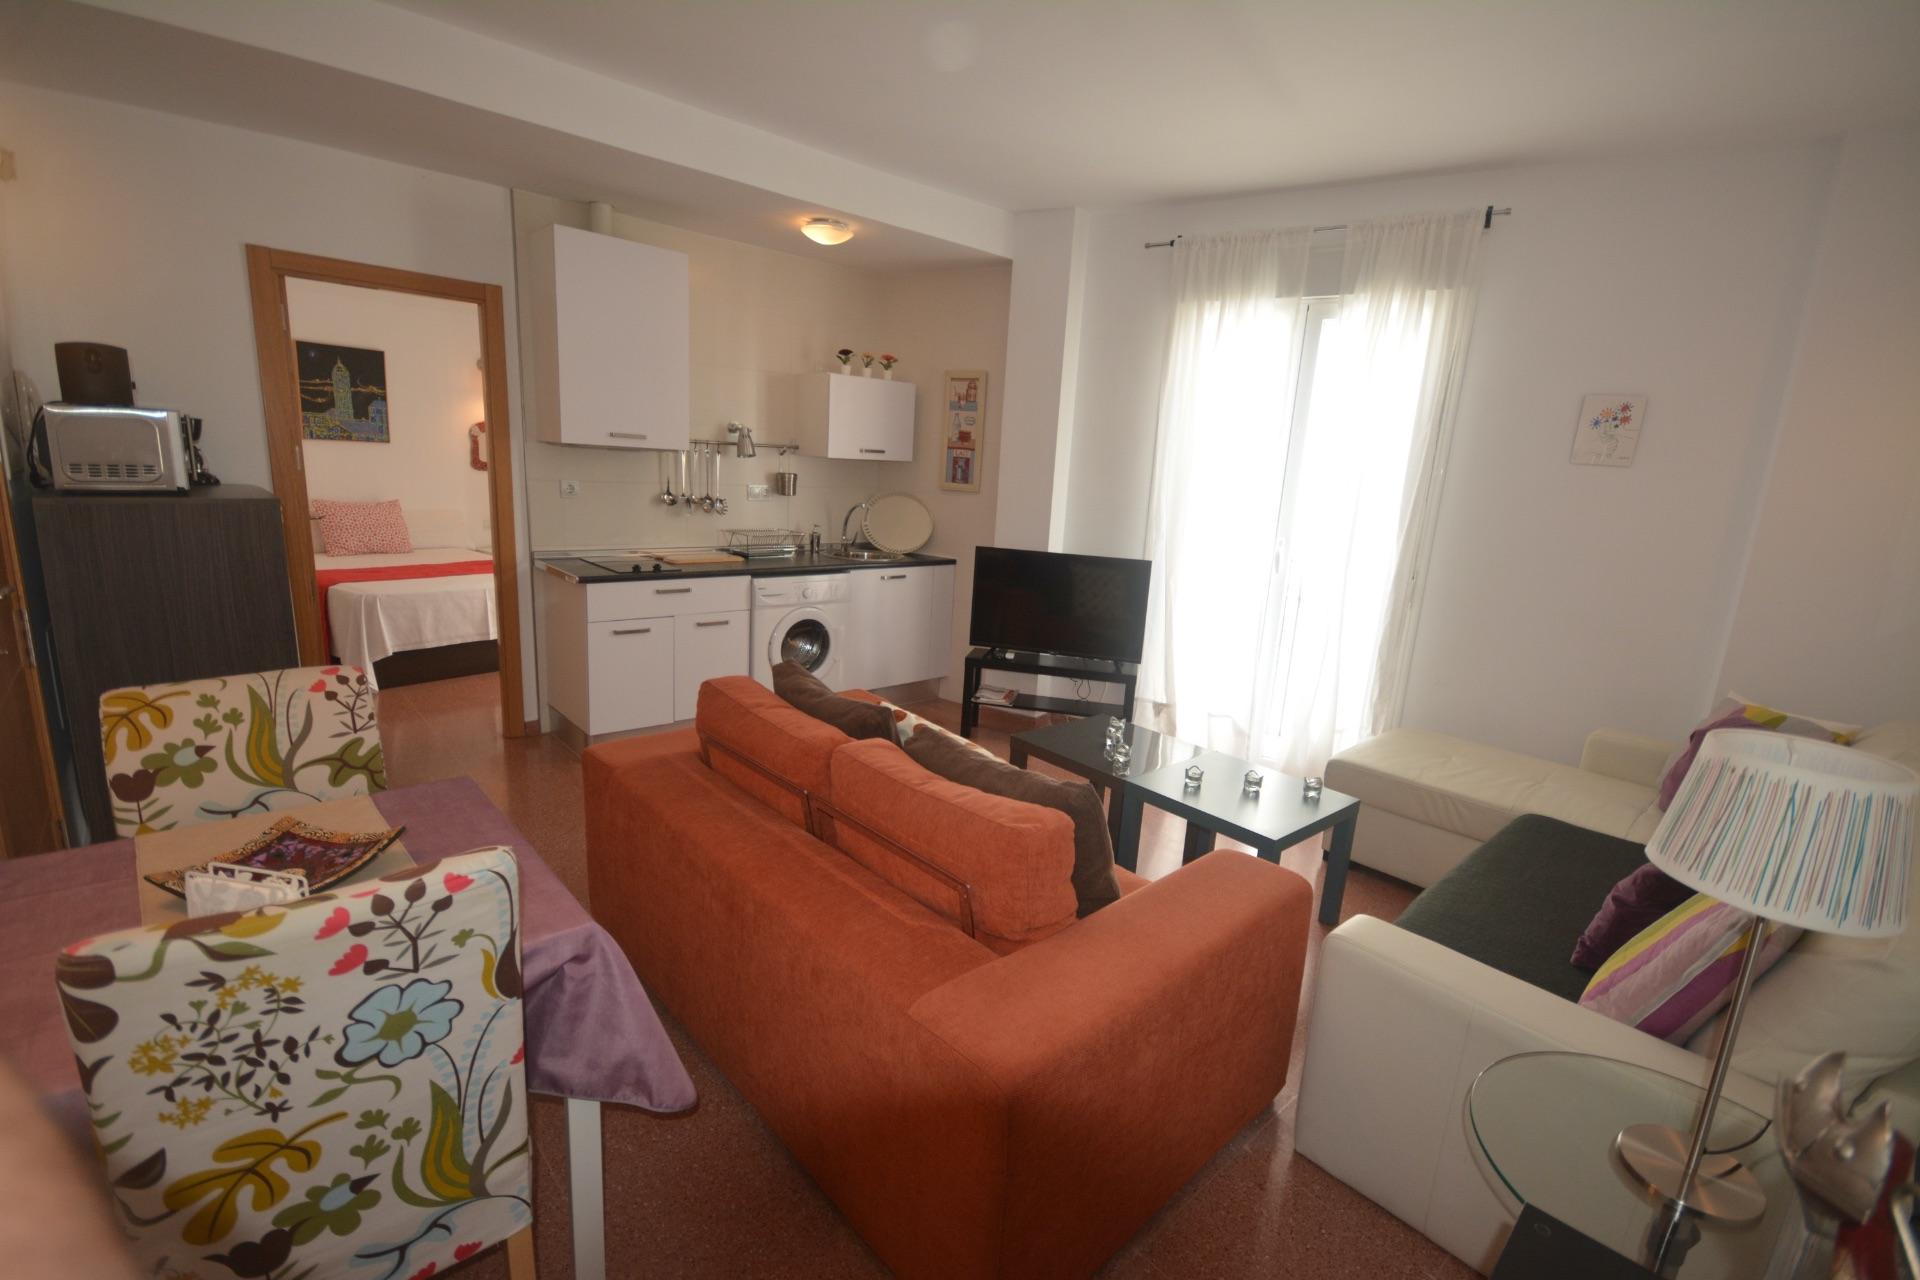 Apartment in Málaga, CENTRO HISTORICO, for rent